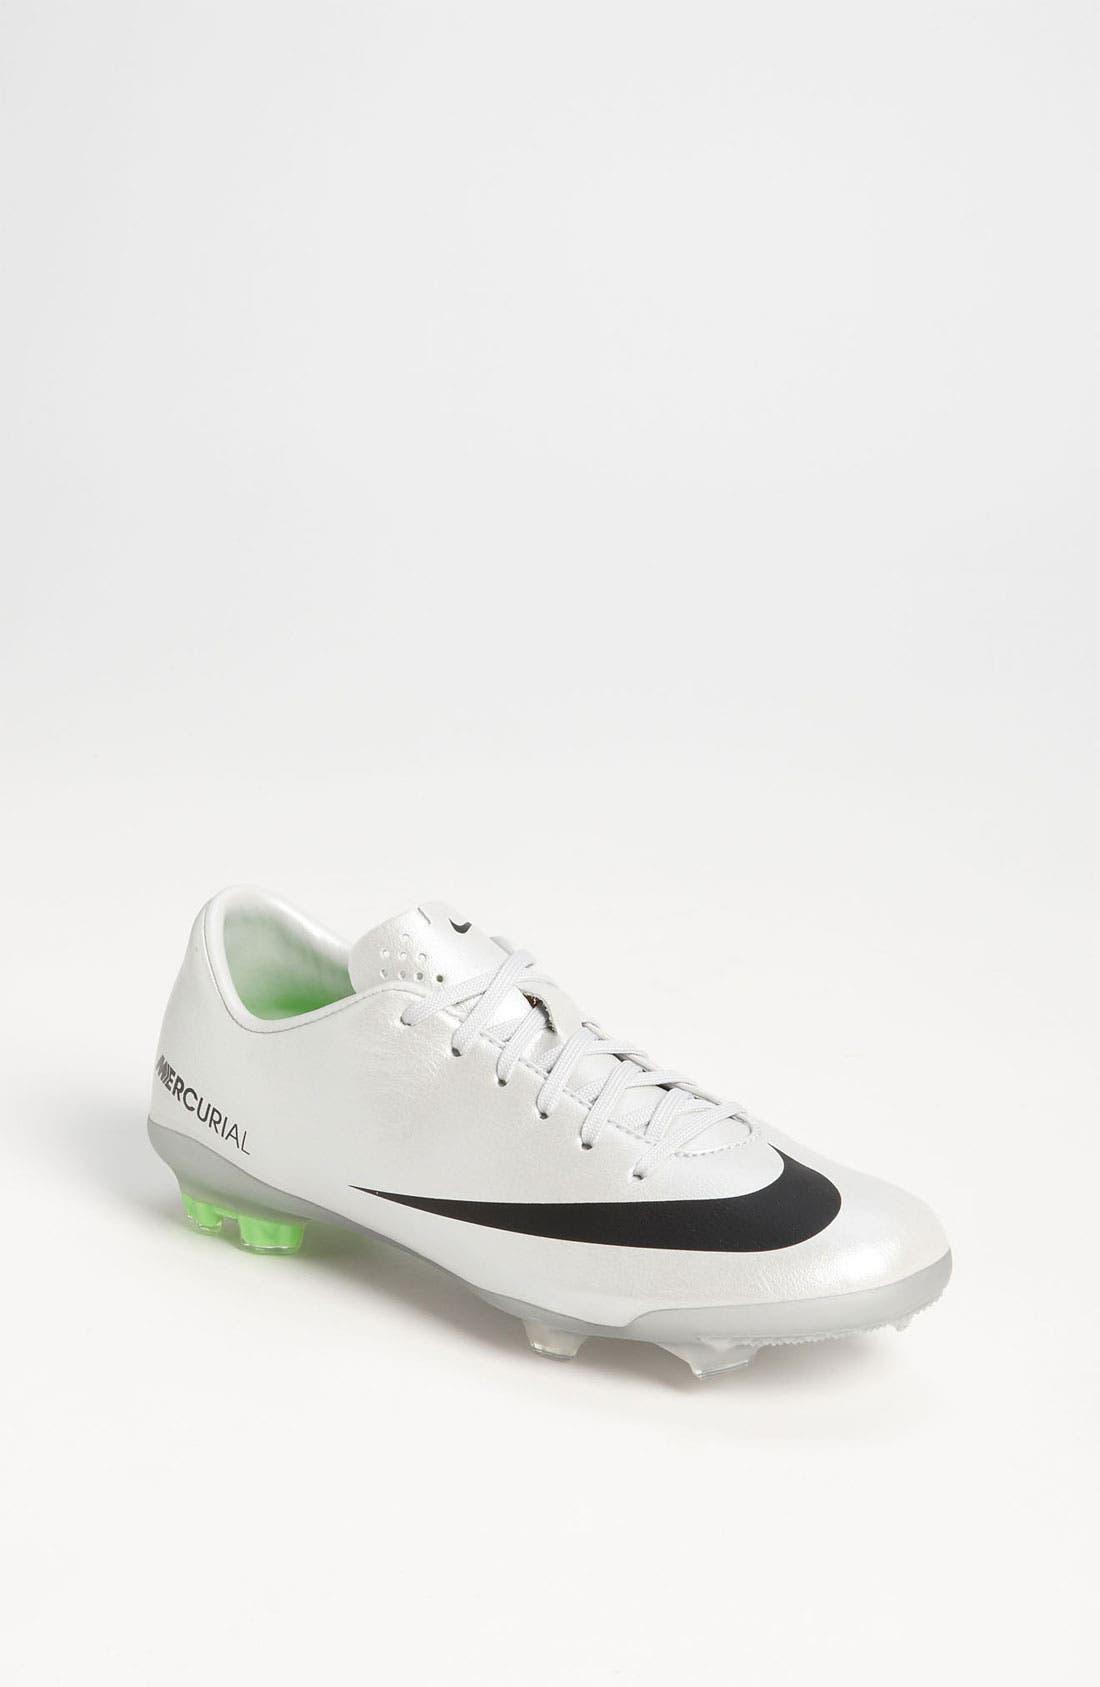 Alternate Image 1 Selected - Nike 'Jr. Mercurial Vapor' Soccer Cleat (Little Kid & Big Kid)